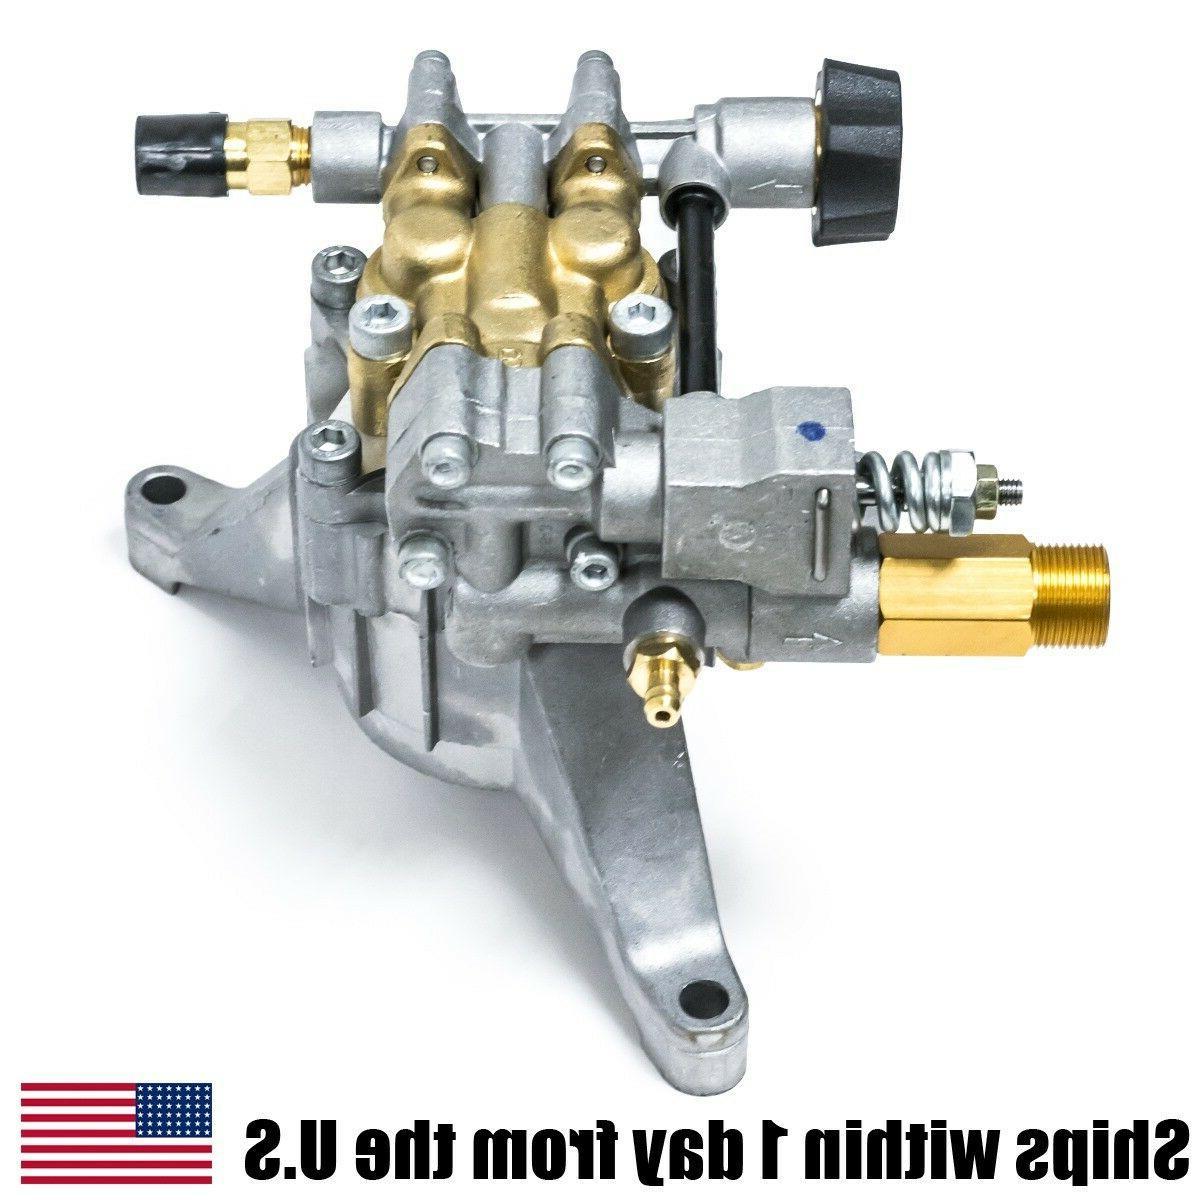 3100 PSI Pressure Pump